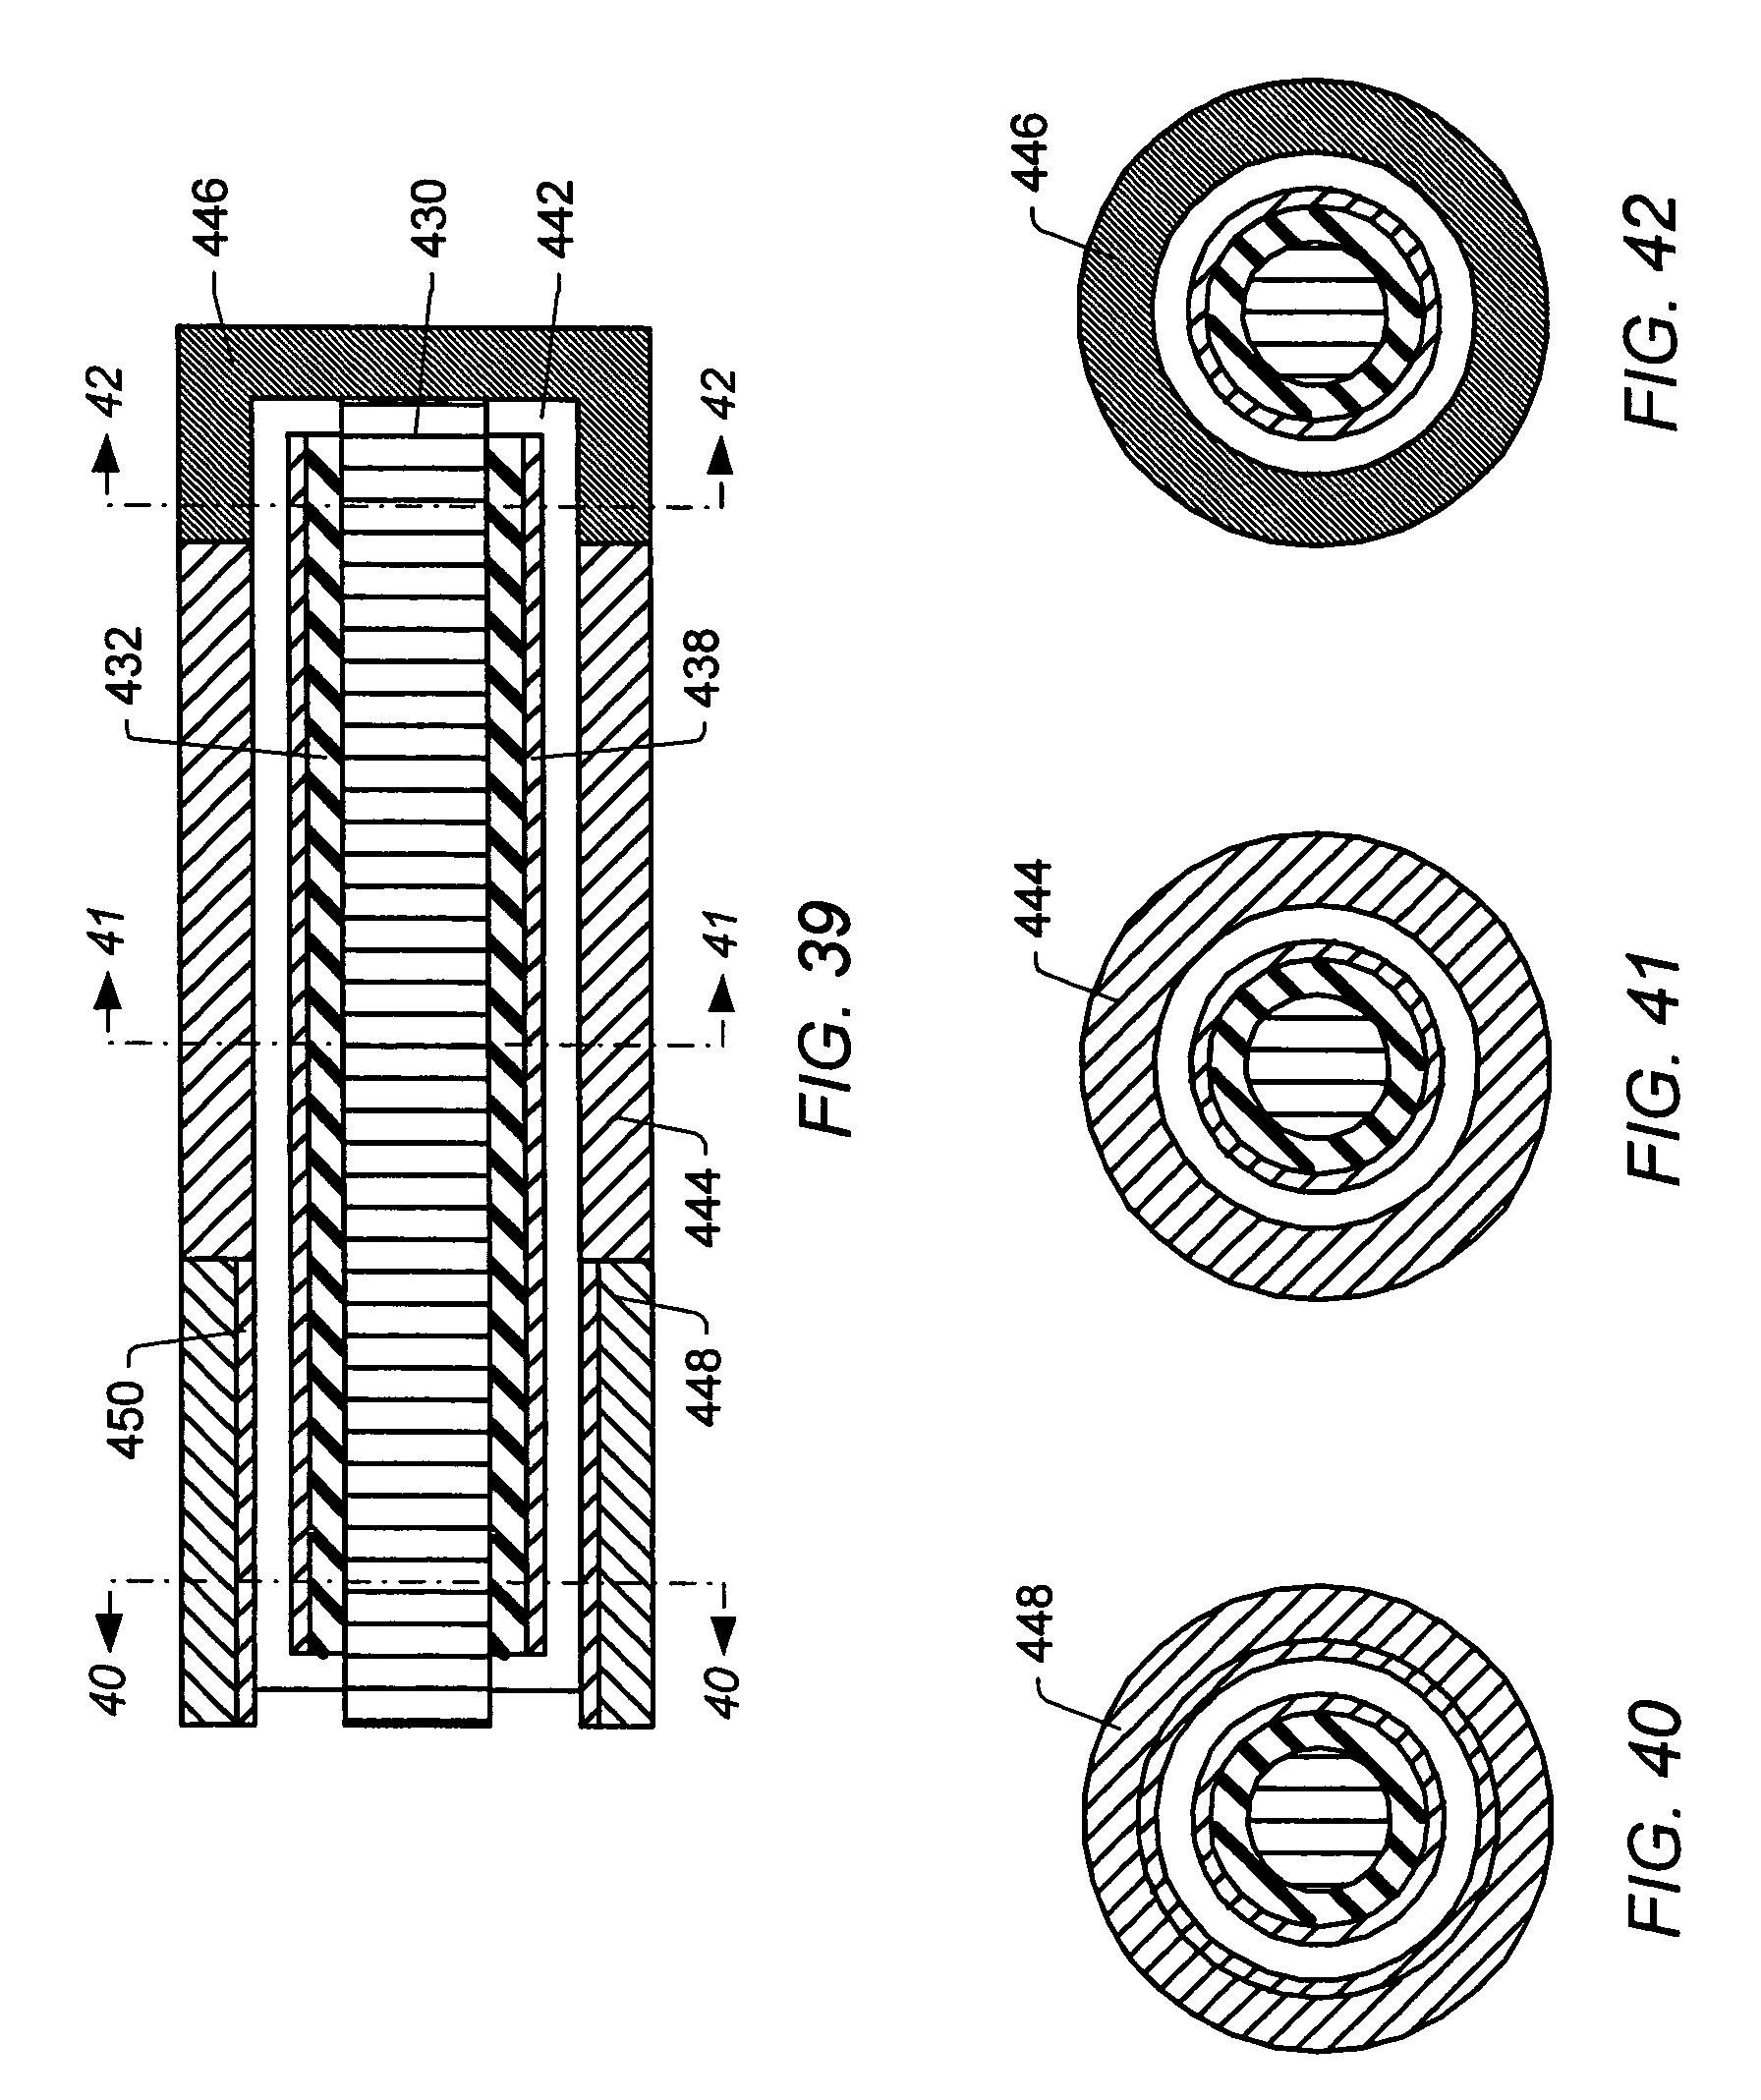 Patent US 8,355,623 B2